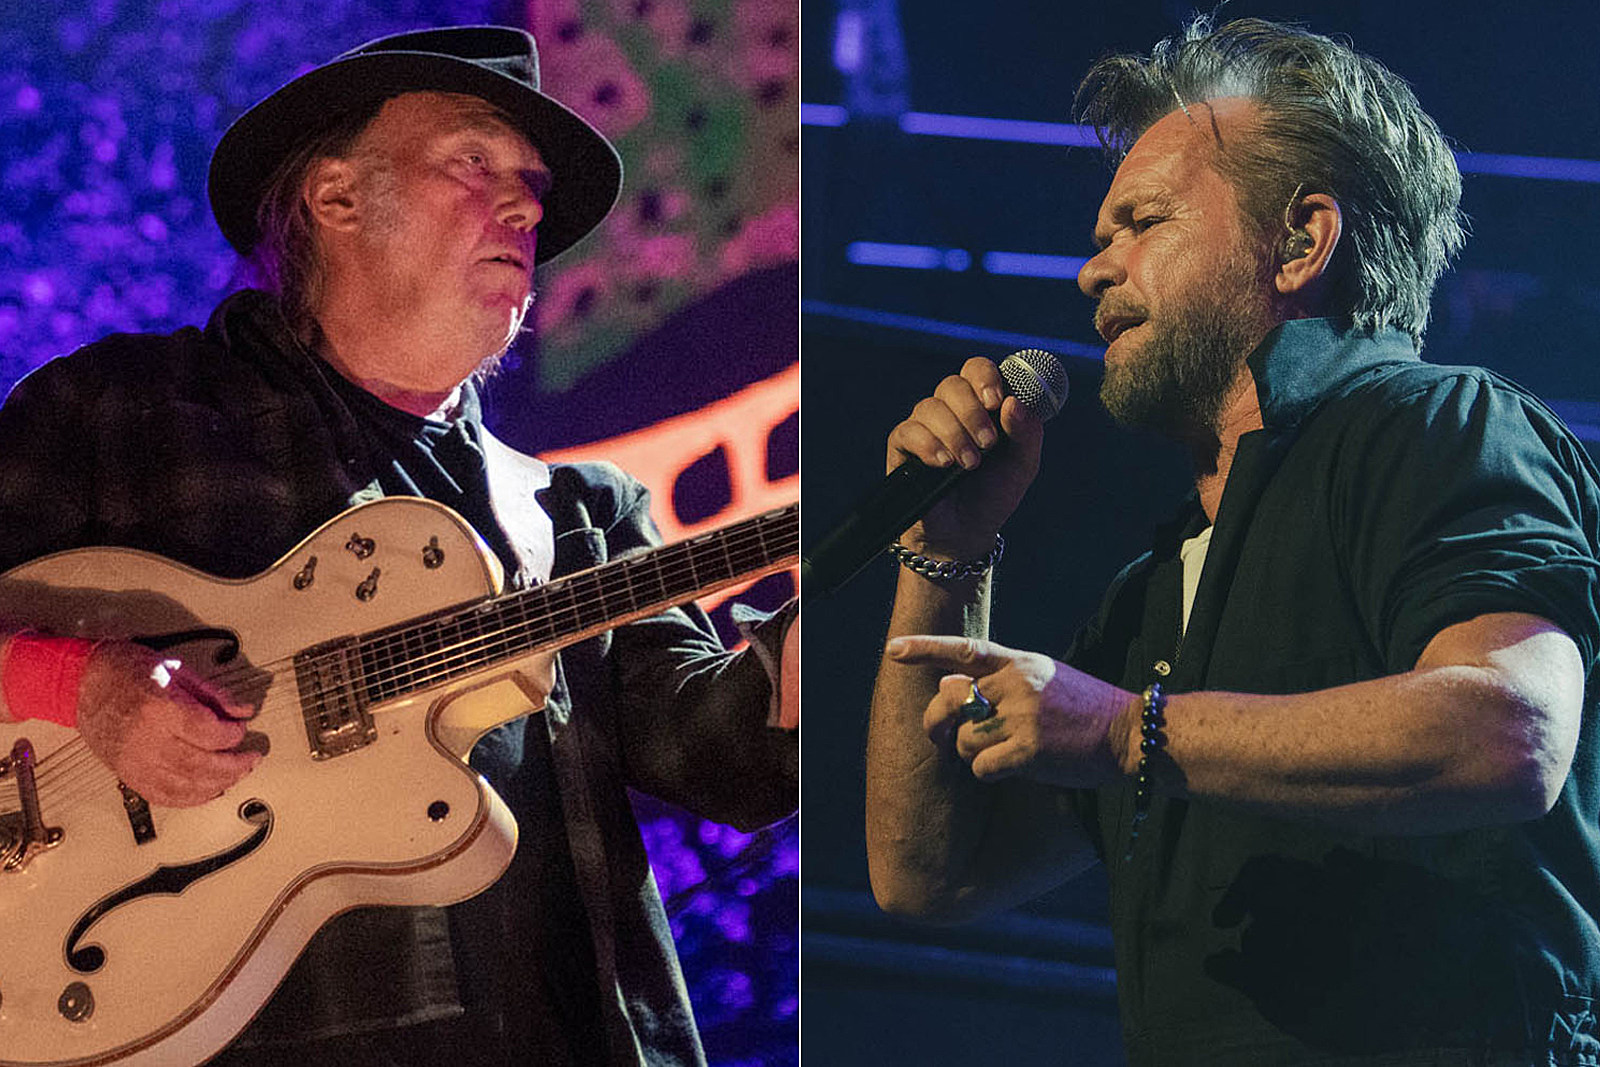 John Mellencamp and Neil Young Slam Trump at Farm Aid: Exclusive Photos